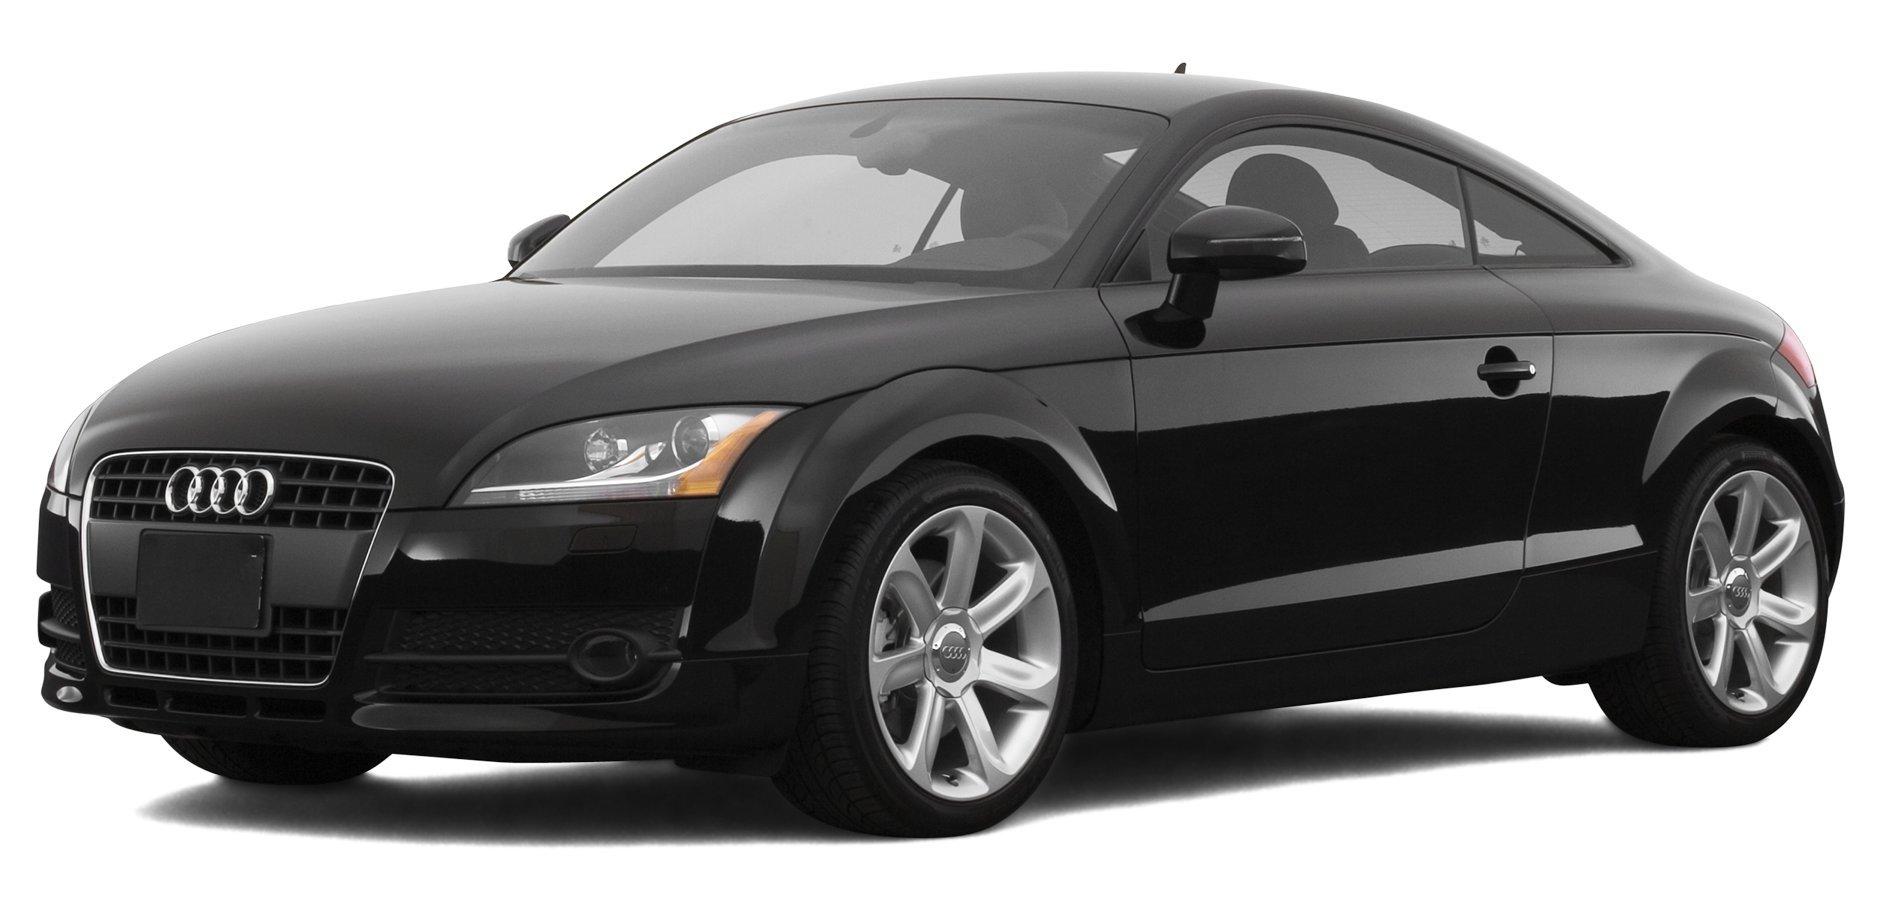 ... 2008 Audi TT 2.0T, 2-Door Coupe Automatic Transmission FrontTrak ...